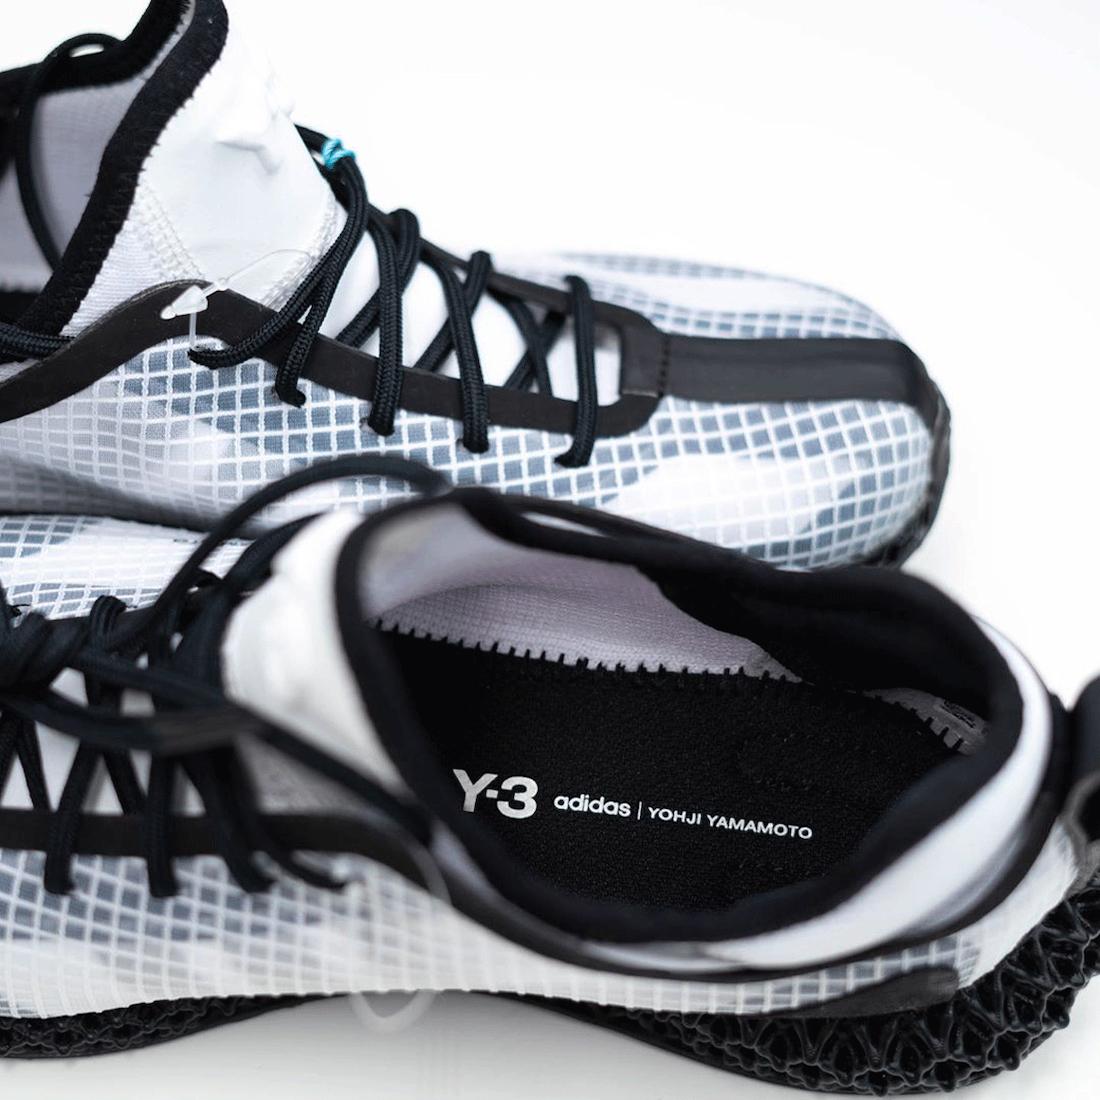 adidas Y-3 Runner 4D IO Sample 2020 Release Date Info